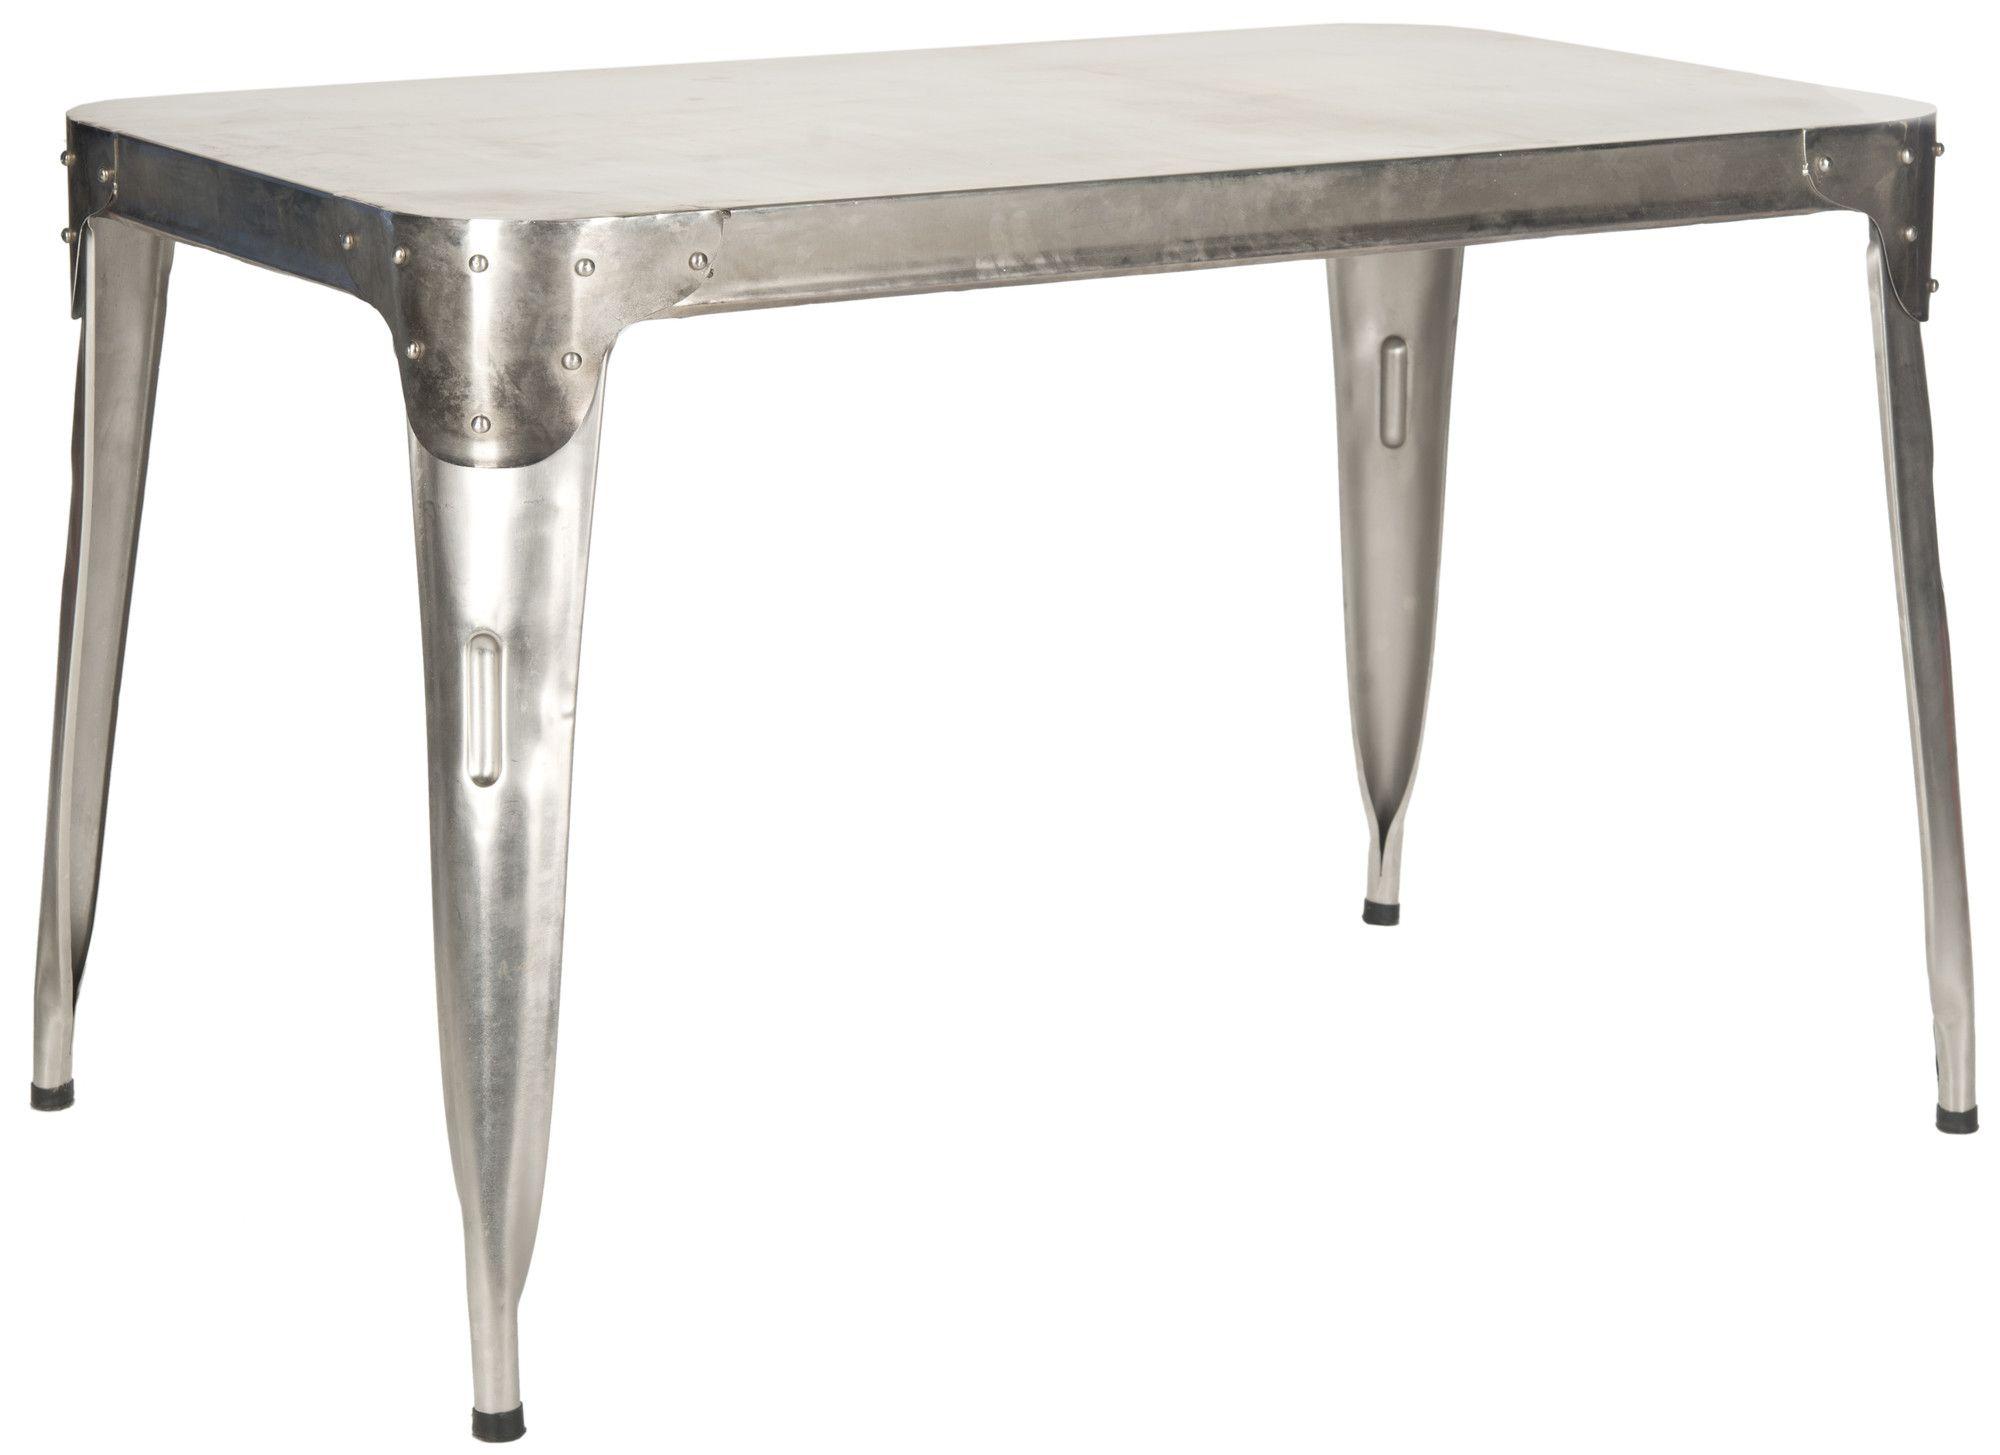 Safavieh Fox Weston Dinning Table Allmodern Industrial Style